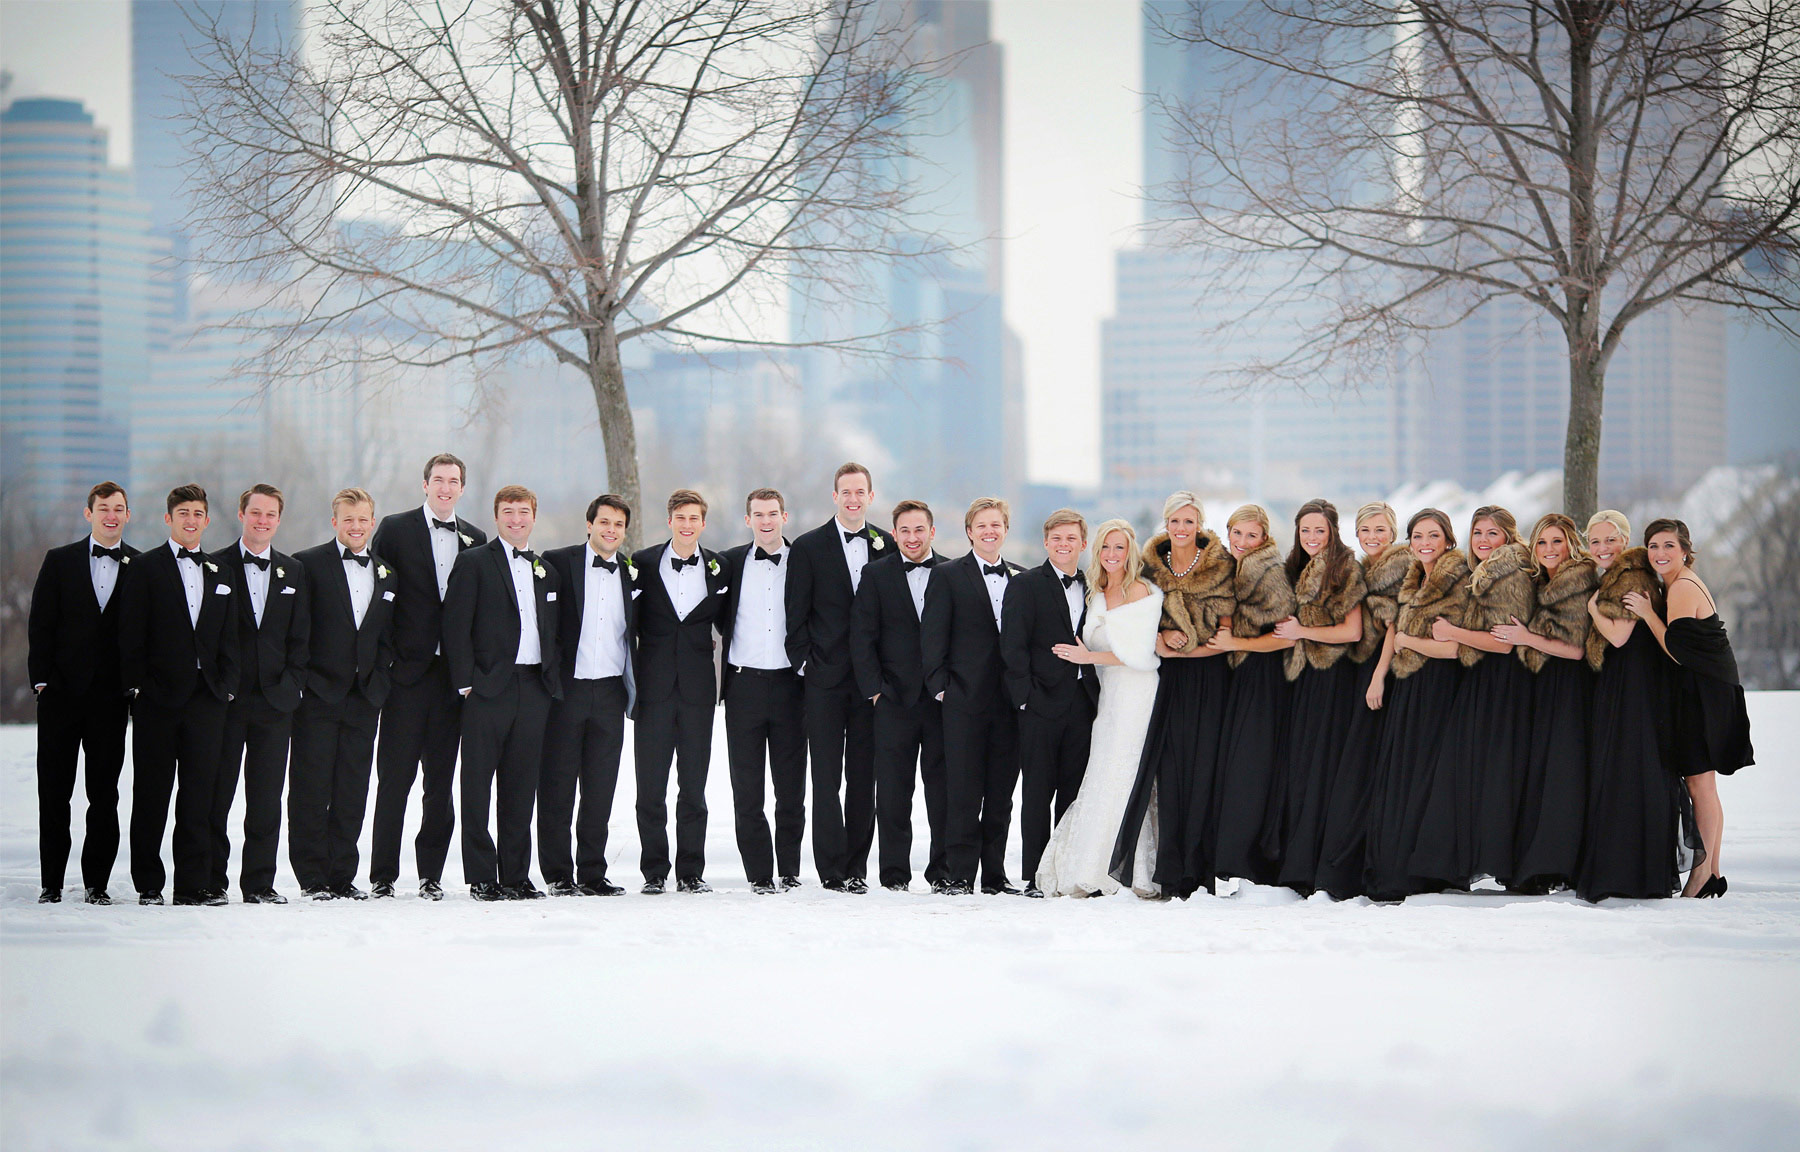 11-Minneapolis-Minnesota-Wedding-Photography-by-Vick-Photography-Downtown-Winter-Wedding-Party-Group-Caroline-and-J.jpg